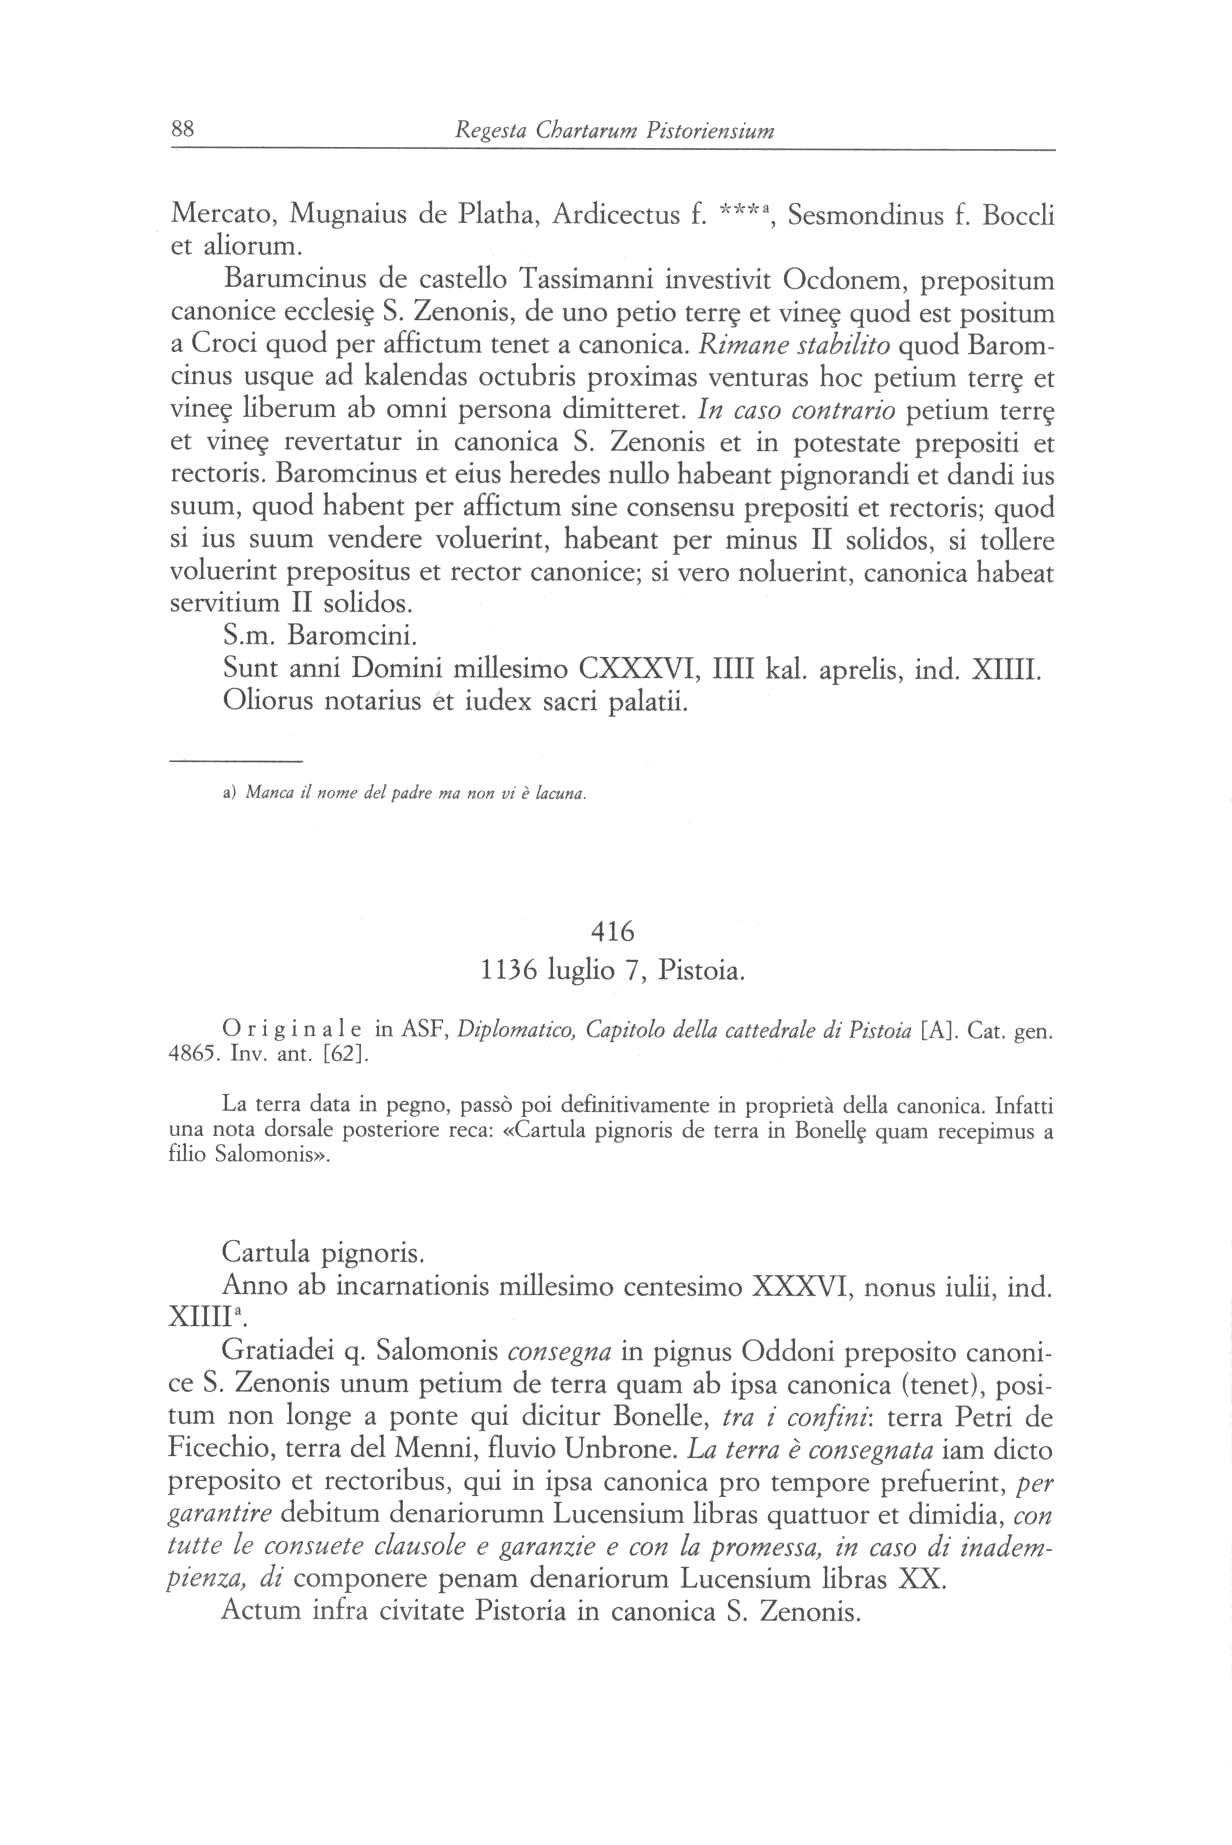 Canonica S. Zenone XII 0088.jpg